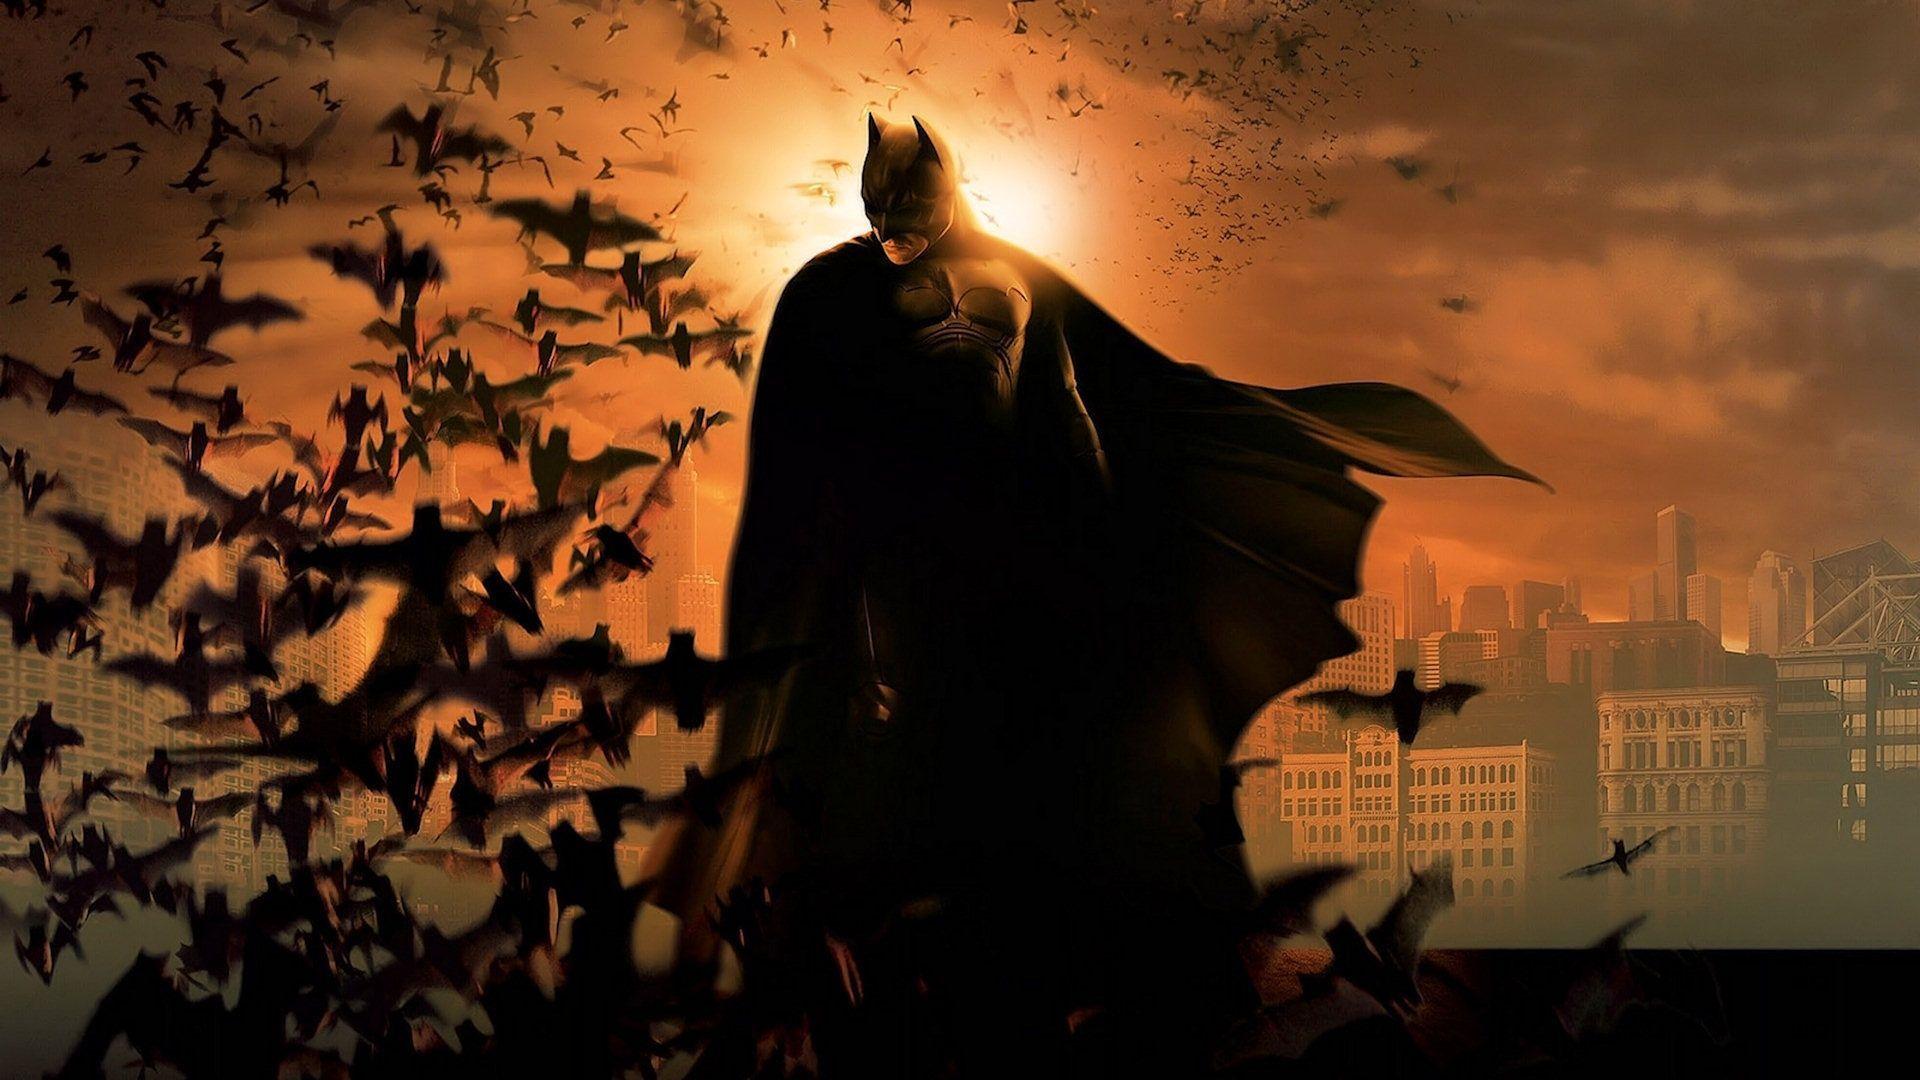 hd batman photo